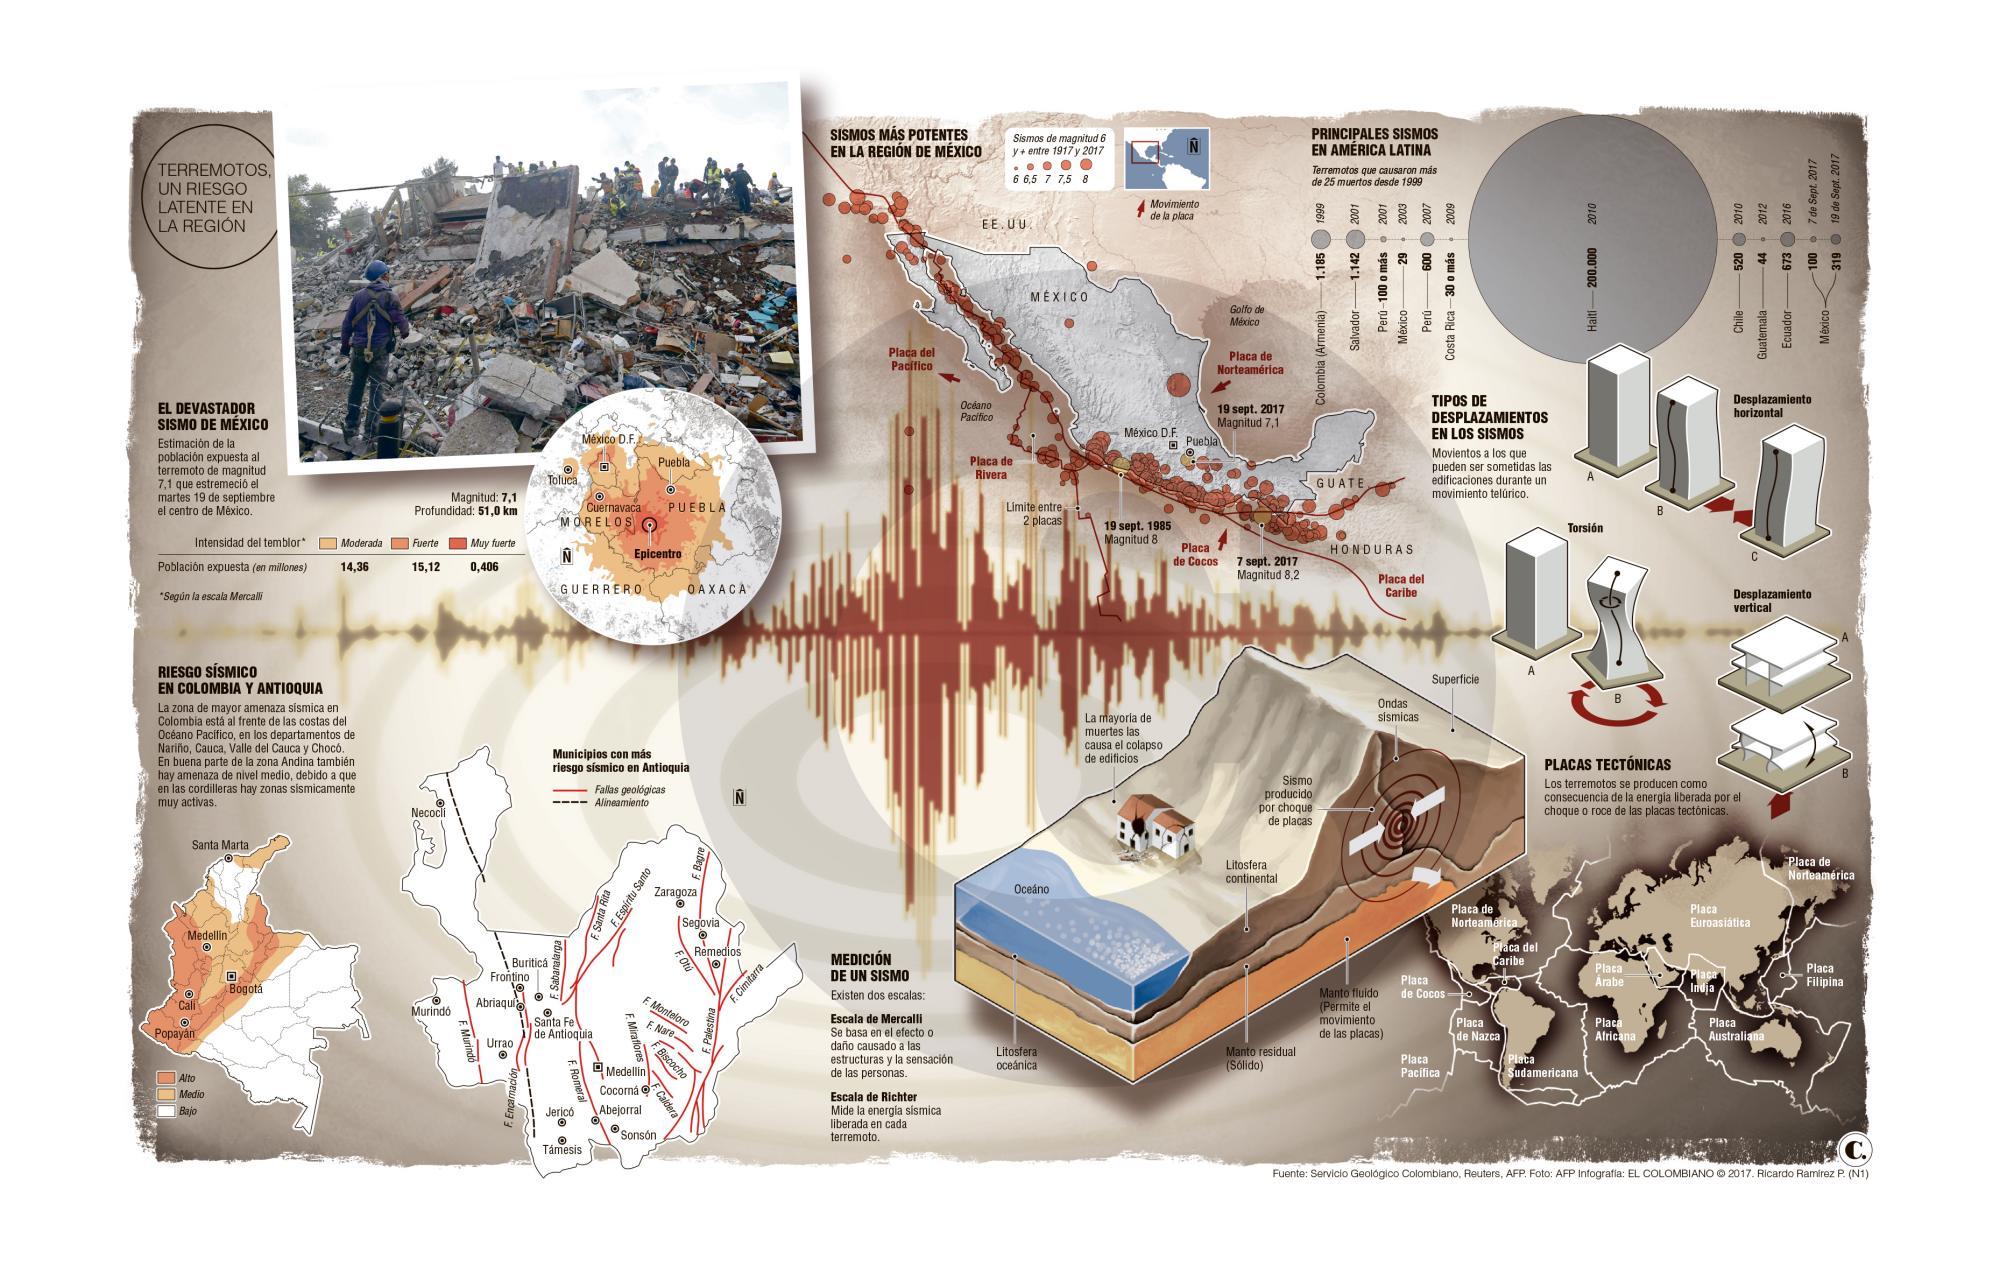 ¿Dónde será el próximo terremoto? Nadie sabe